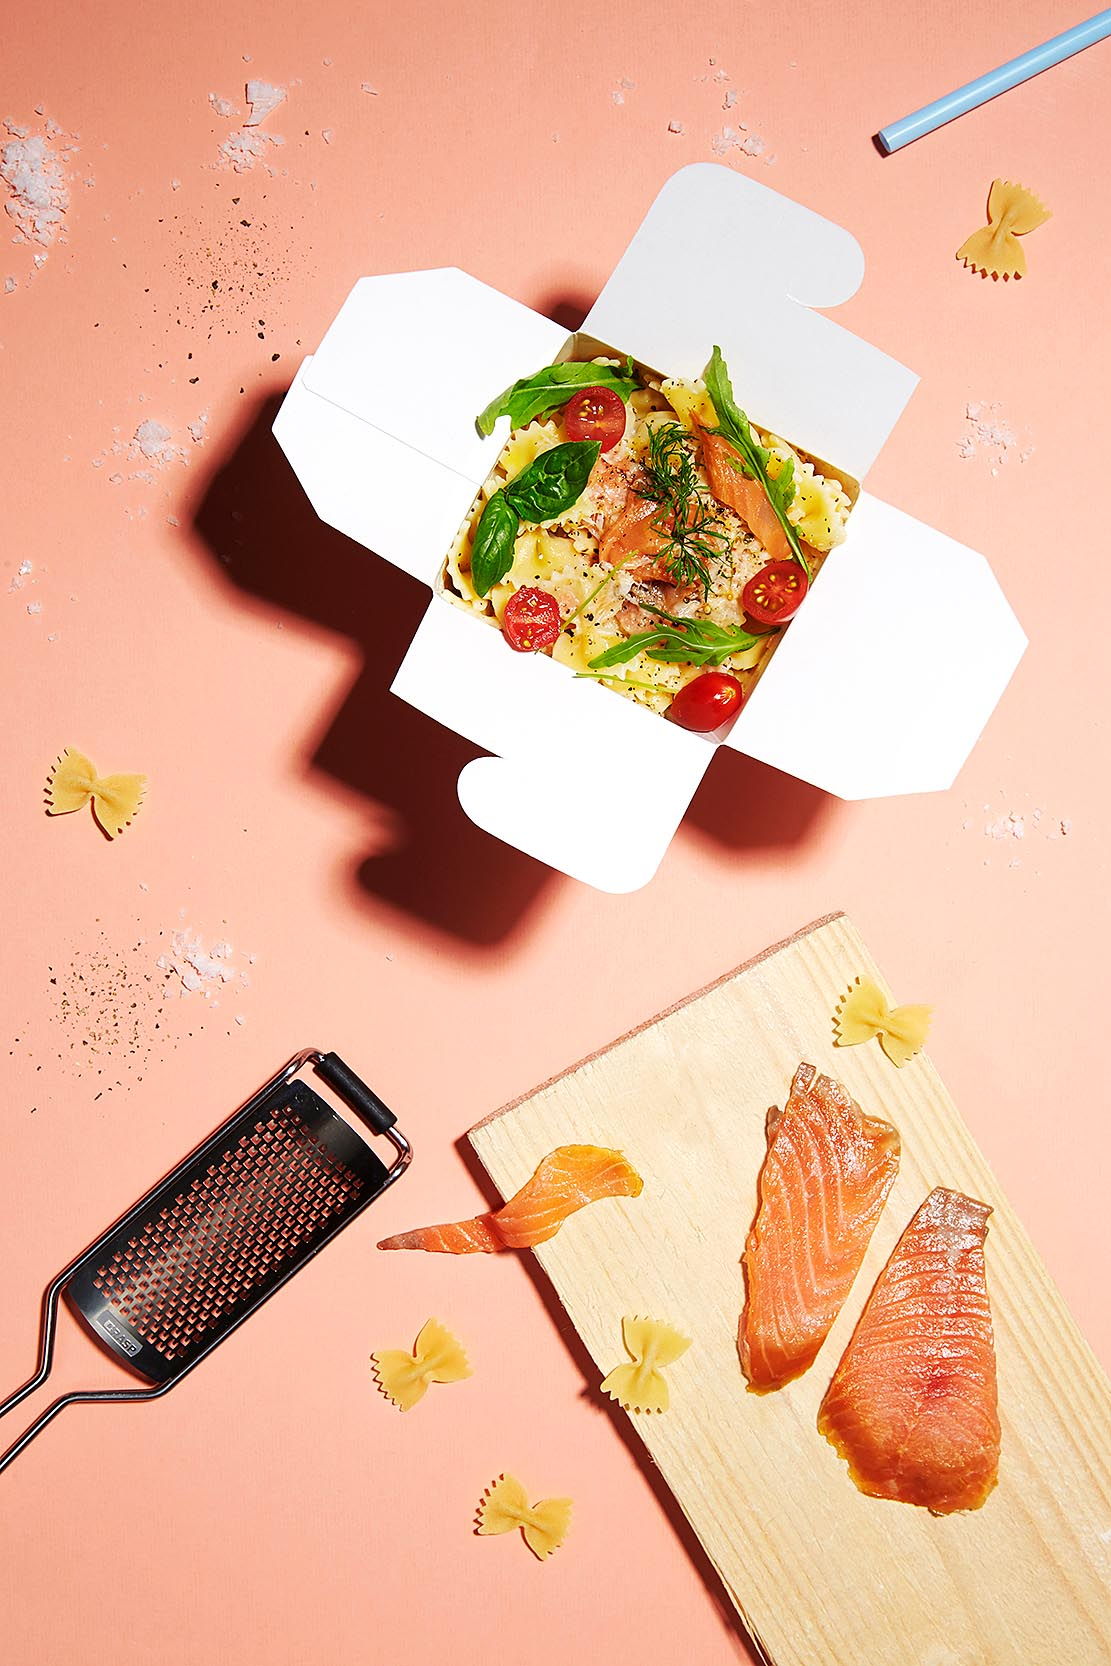 Hans Välimäki / Pasta Box brand photos / Juuso Salakka & Tony Eräpuro / Kuudes kerros / photography Panu Pälviä